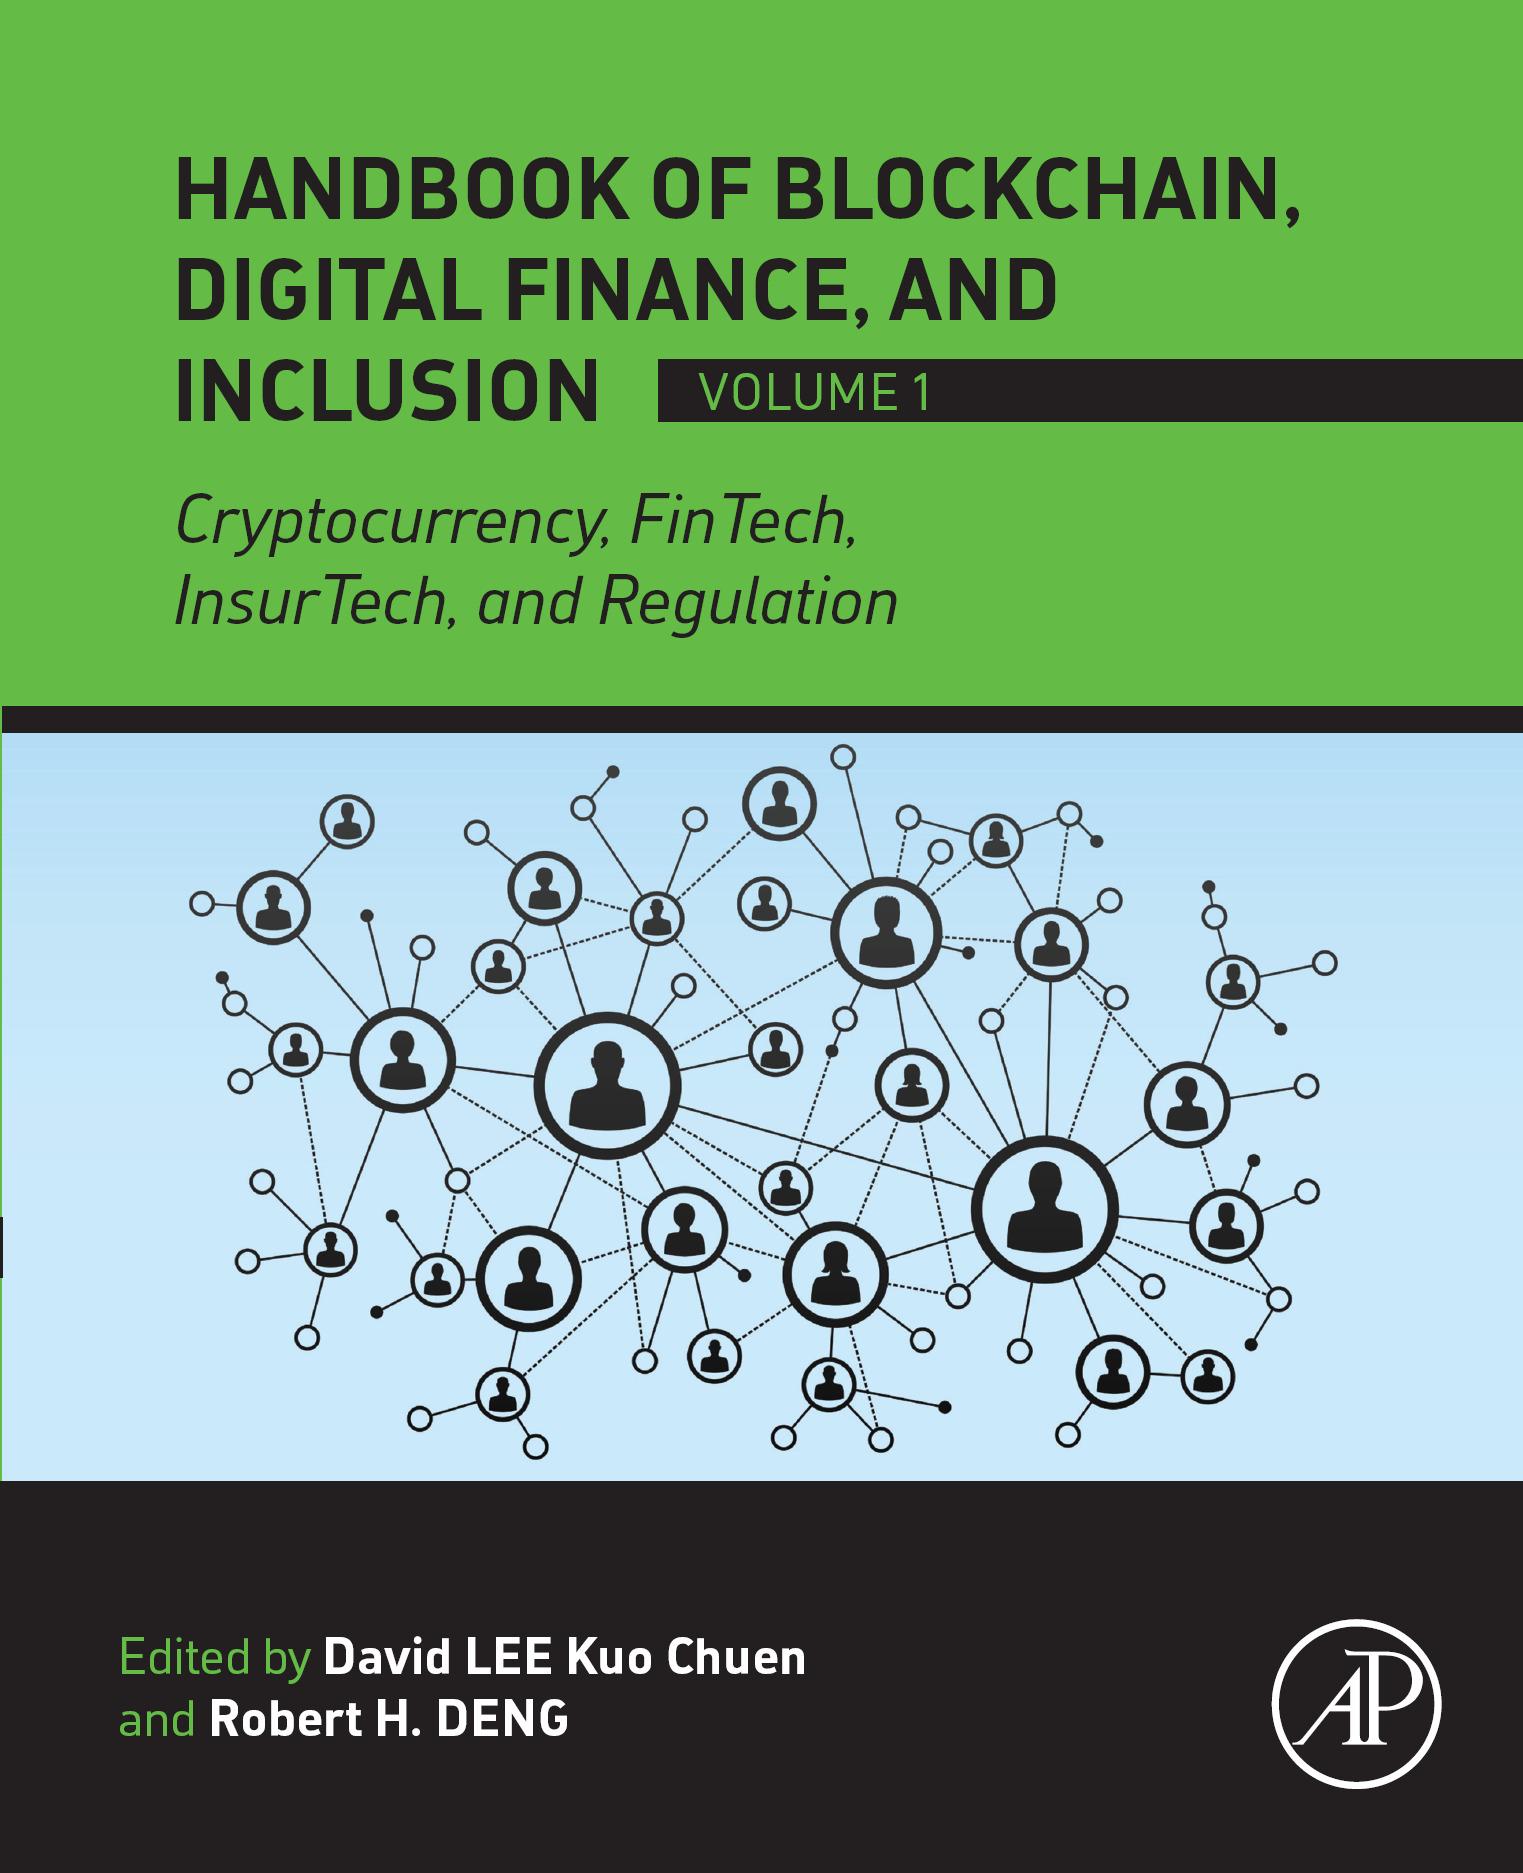 Download Ebook Handbook of Blockchain, Digital Finance, and Inclusion, Volume 1 by David LEE Kuo Chuen Pdf